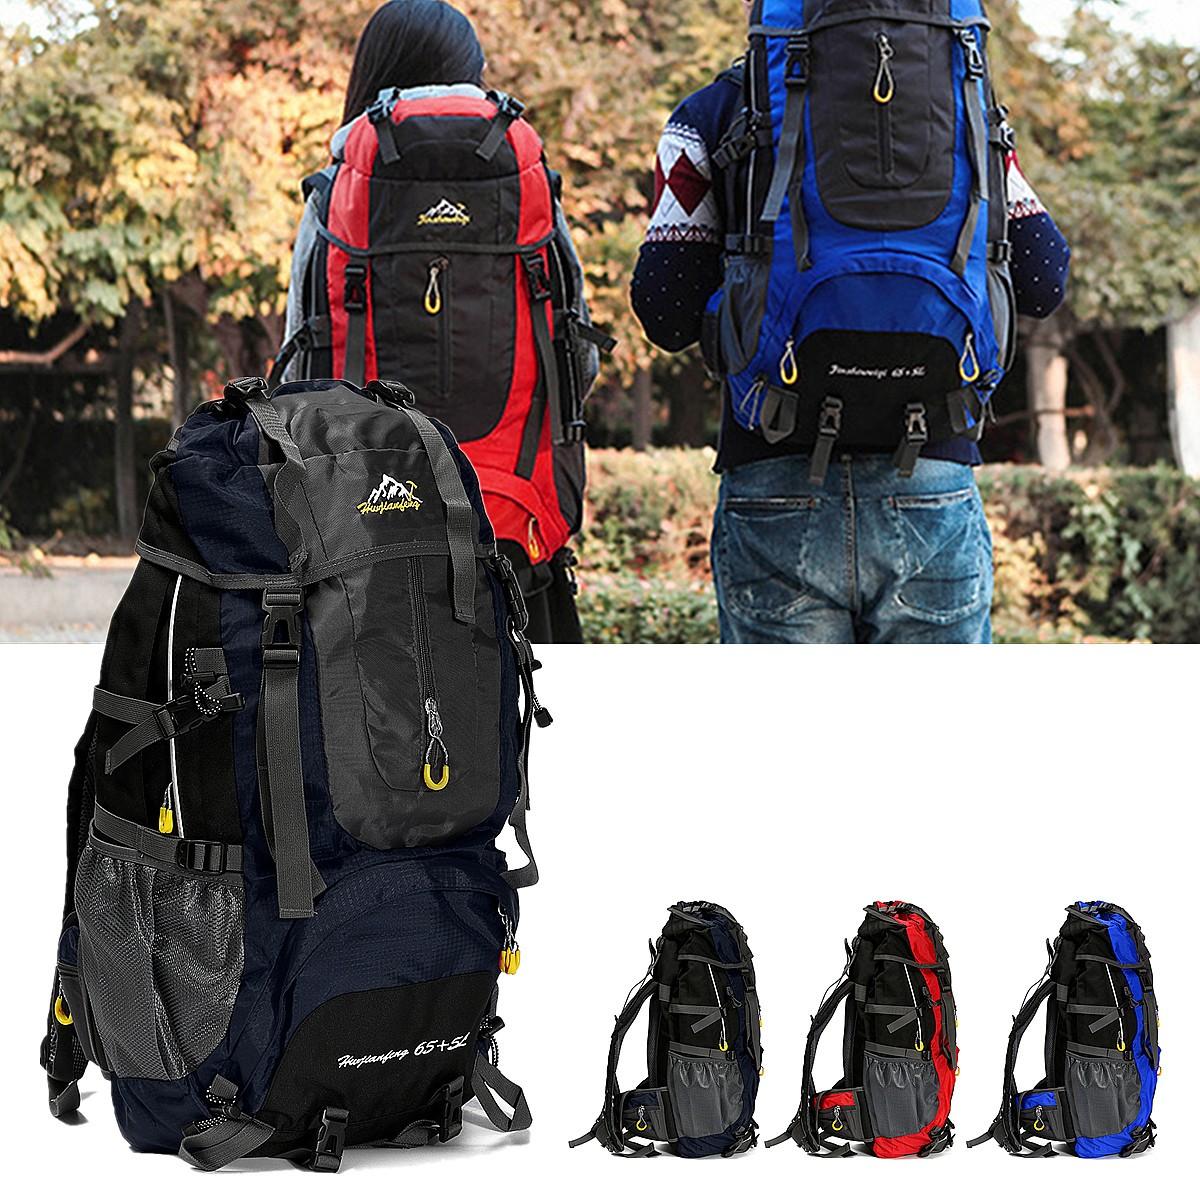 Outdoor 70L Waterproof Rucksack Backpack Camping Hiking Trekking Travel Shoulder Bag Pack